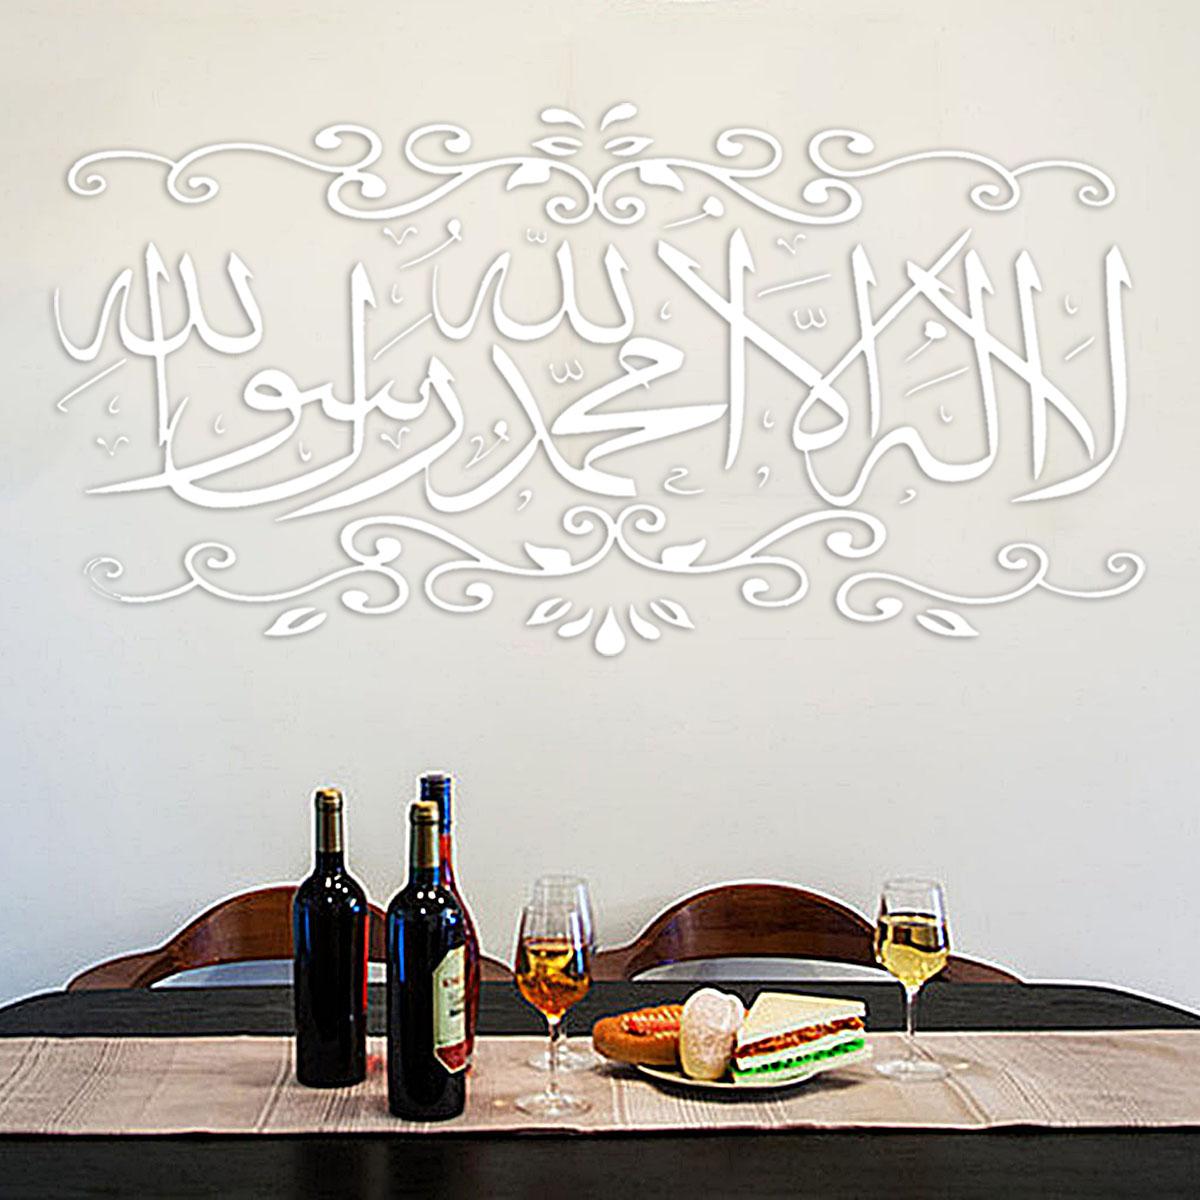 3D Acrylic Mirror Wall Sticker Home Decor Living Room Mural Islamic Wall Decal